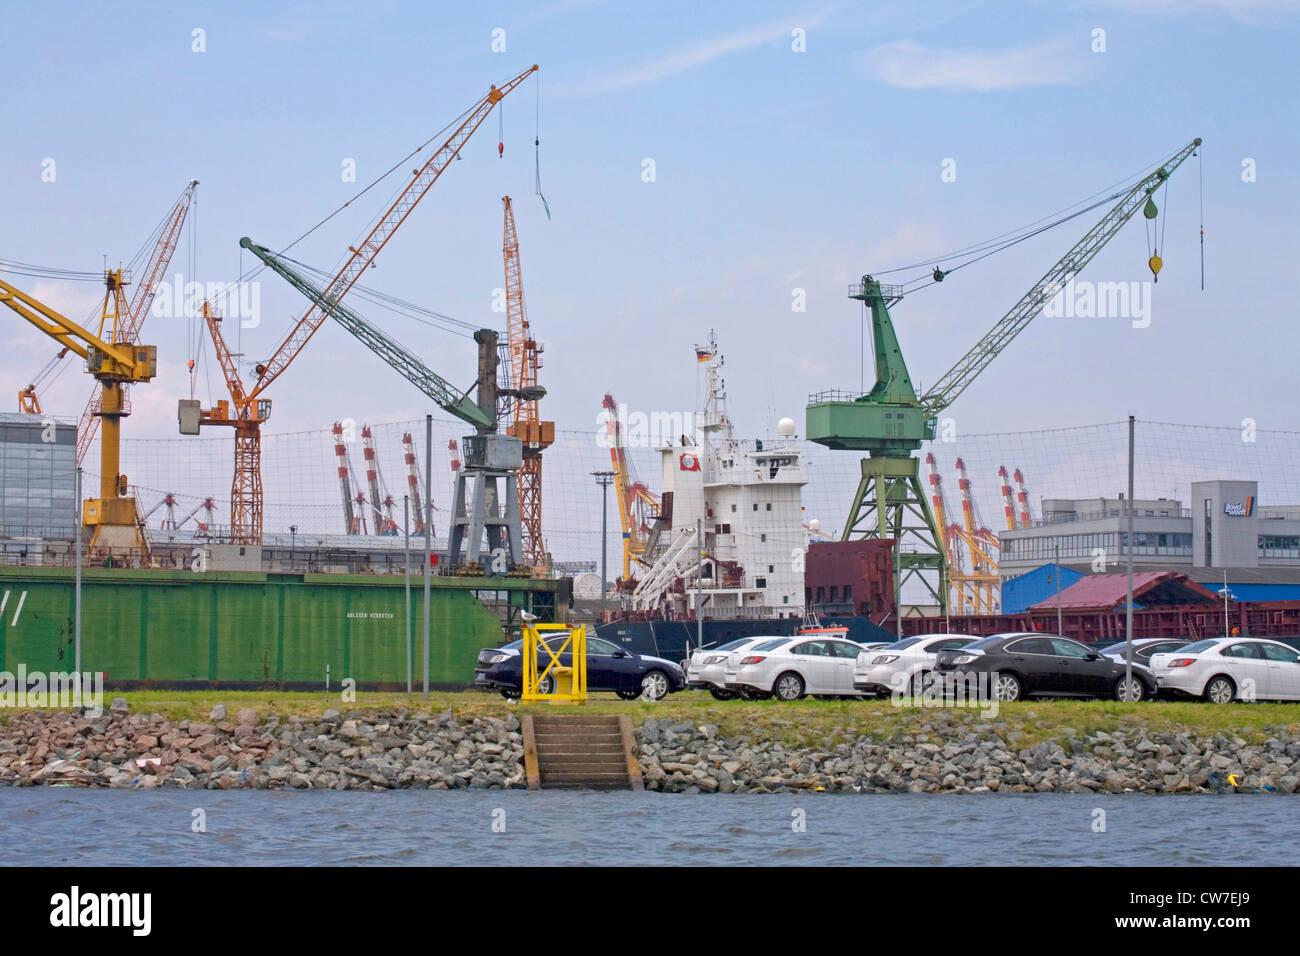 tower cranes at the harbour, Germany, Freie Hansestadt Bremen, Bremerhaven - Stock Image